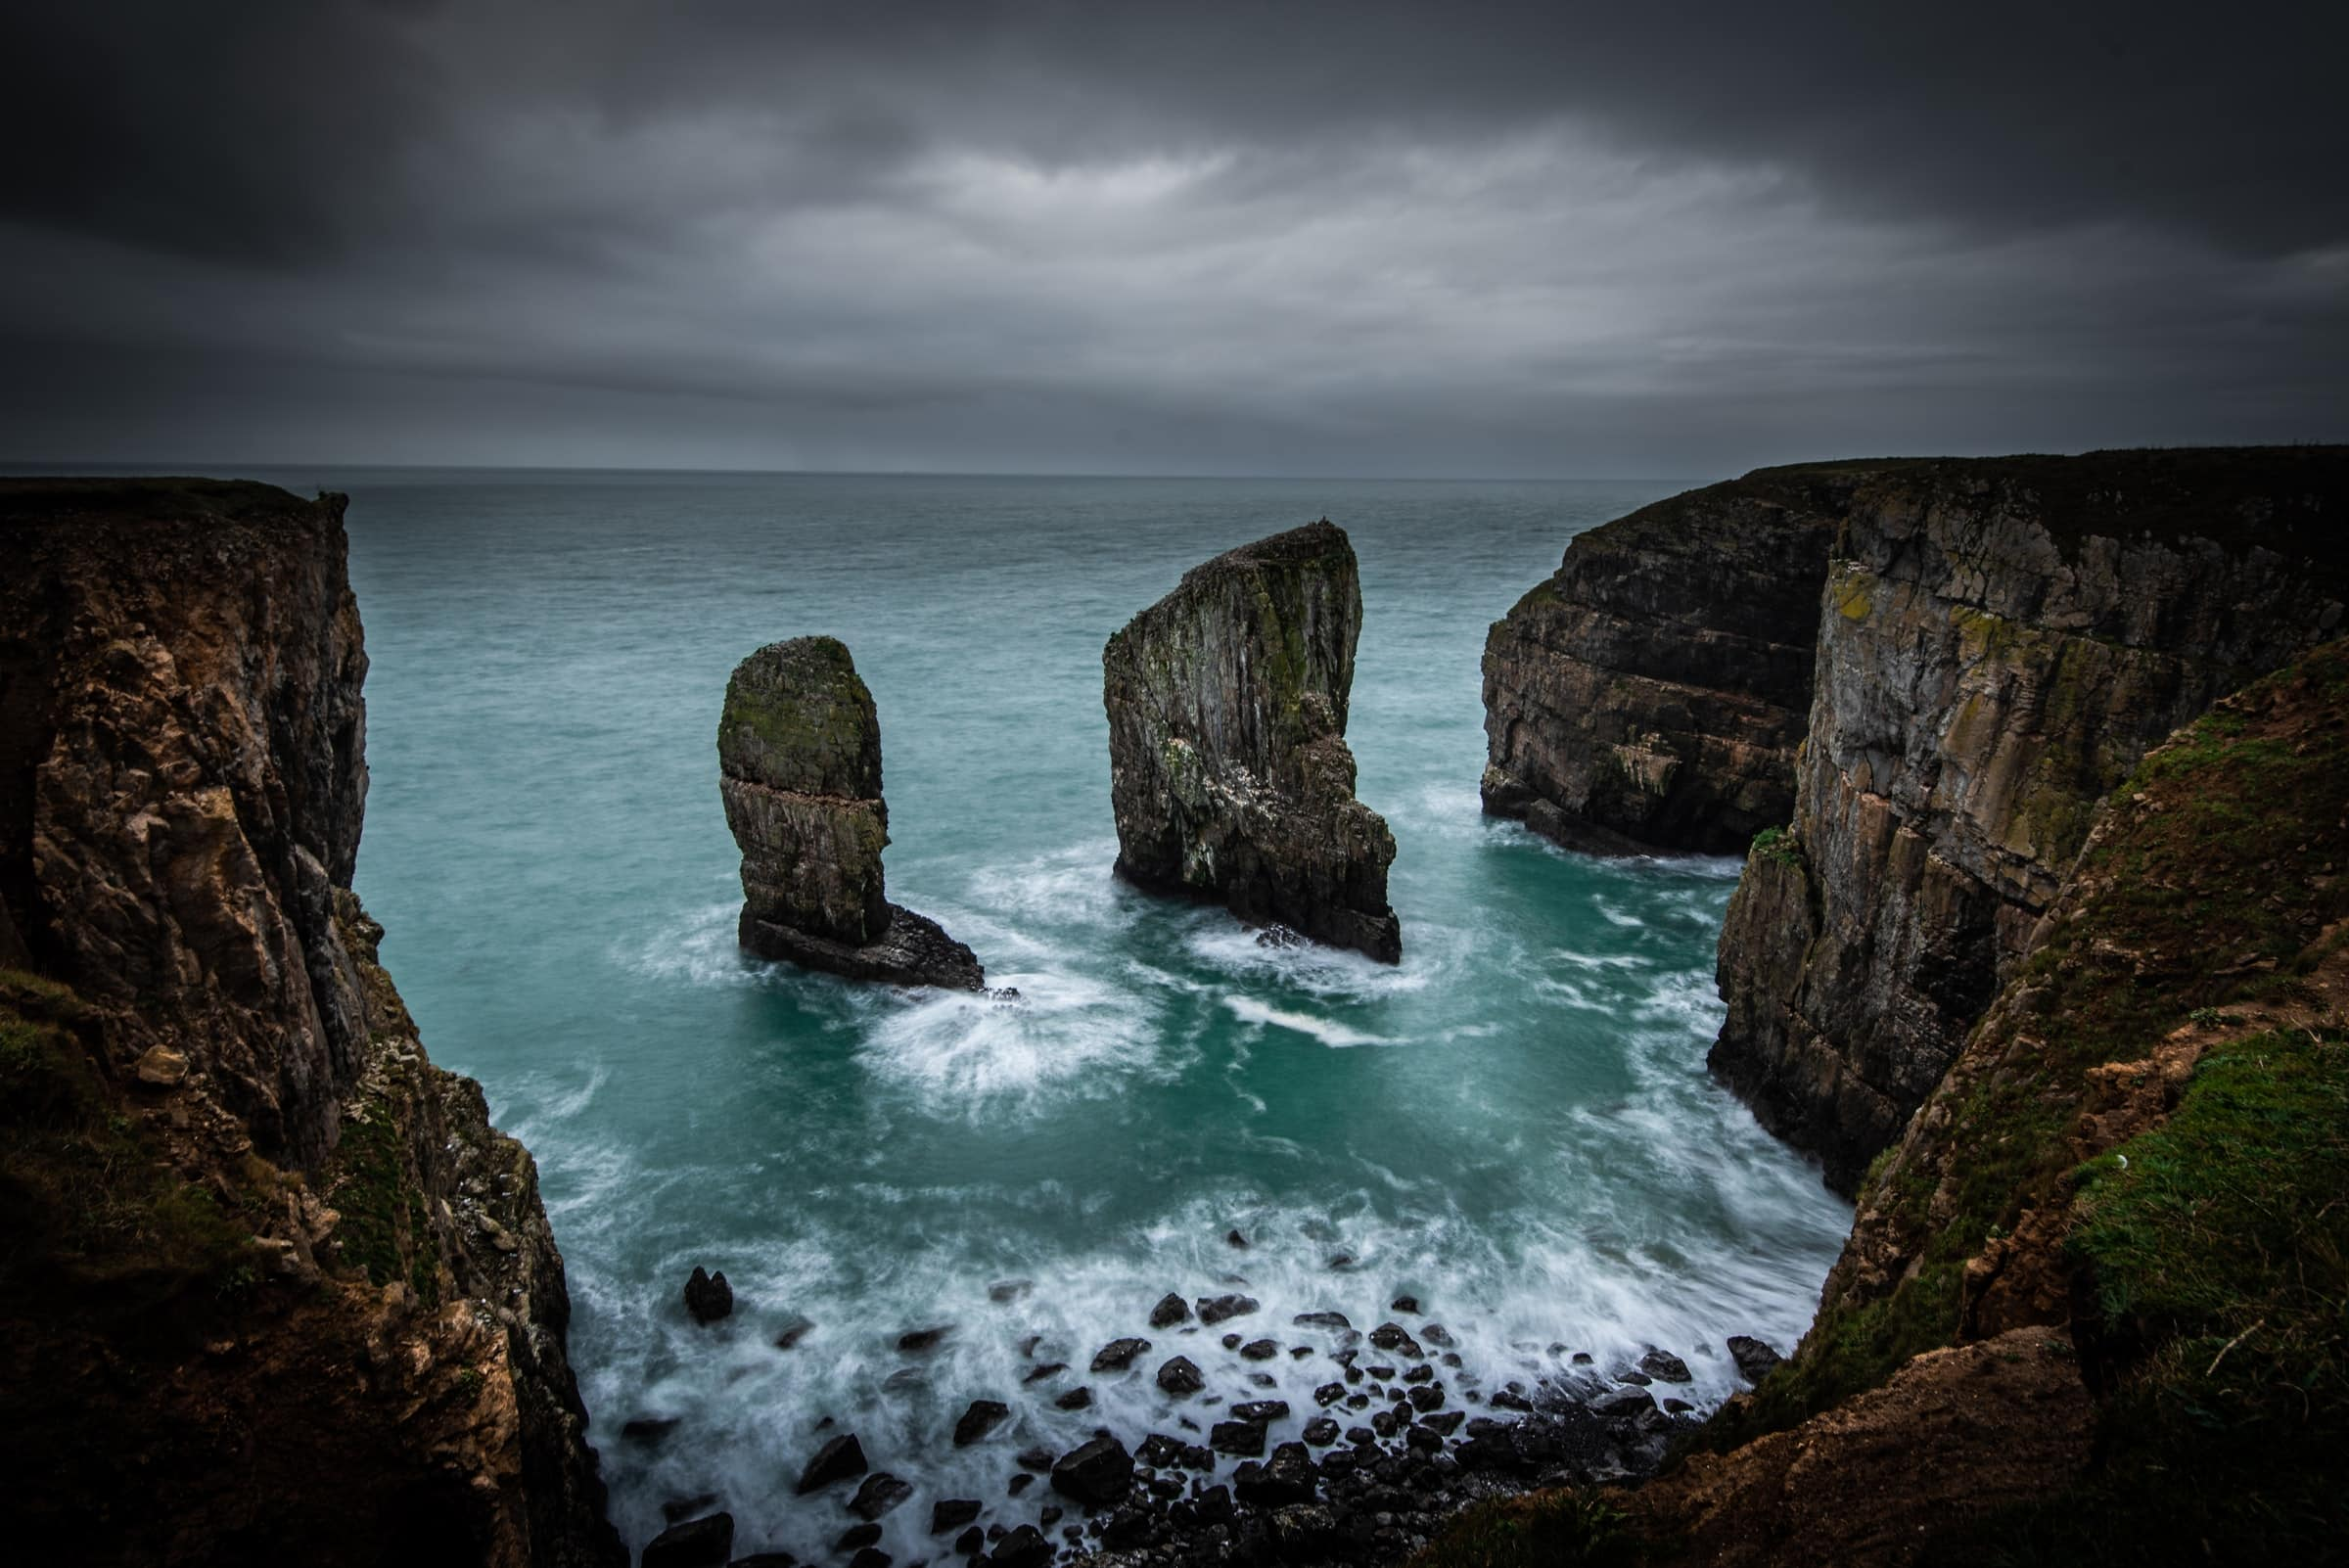 Elegug sea stacks in Pembrokeshire